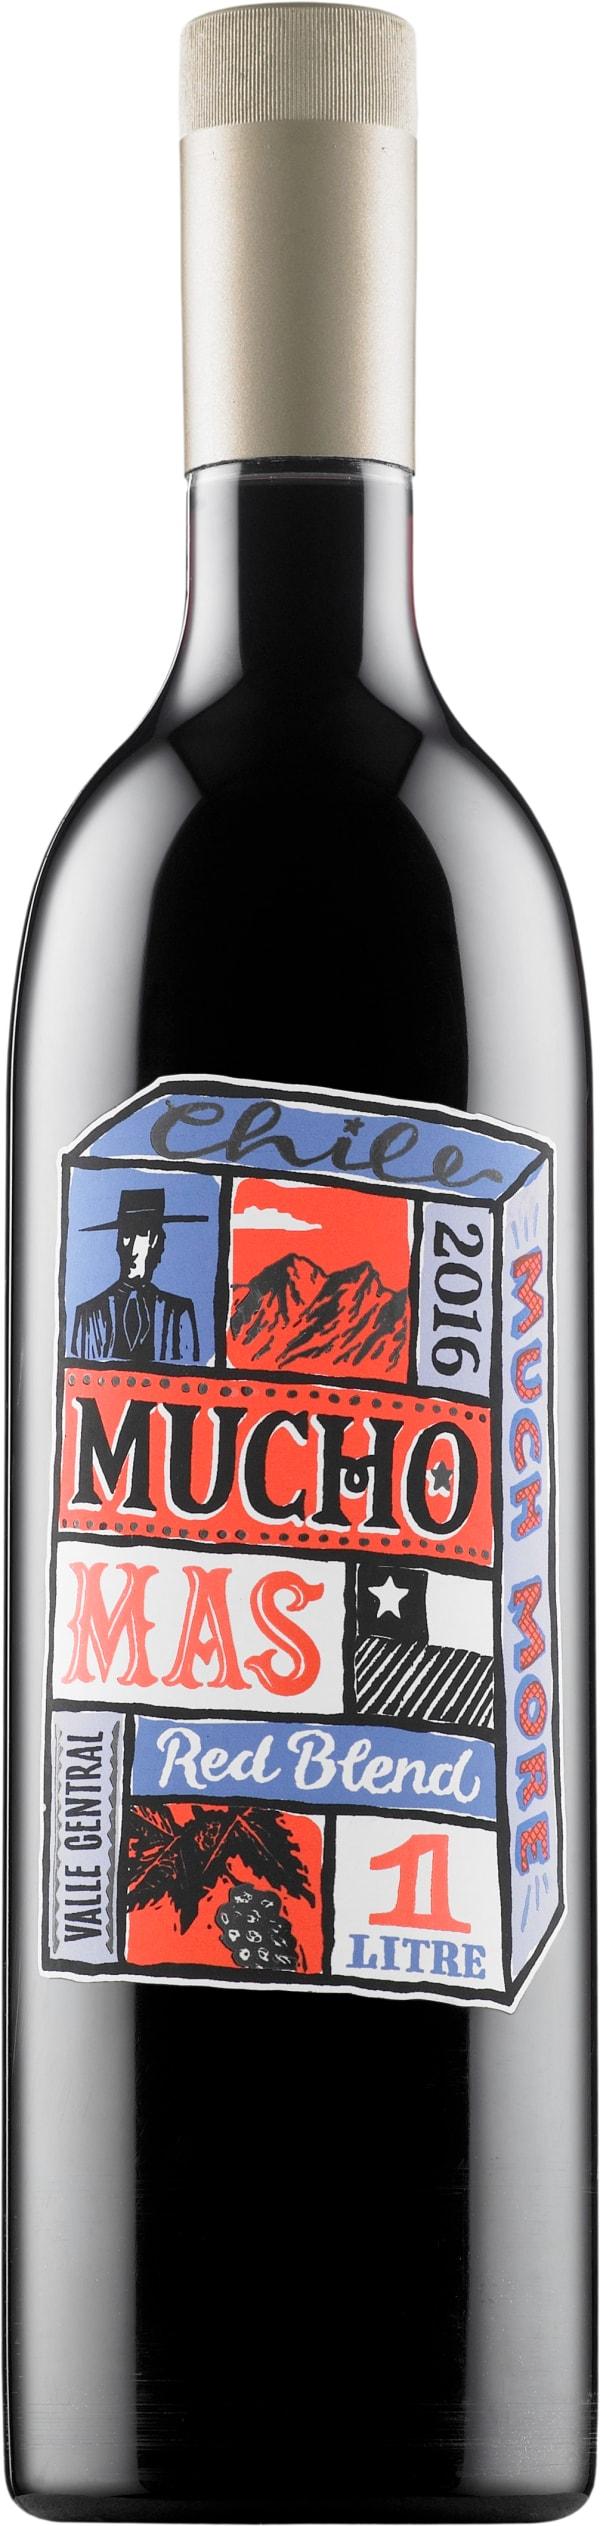 Mucho Mas Red Blend 2019 plastic bottle